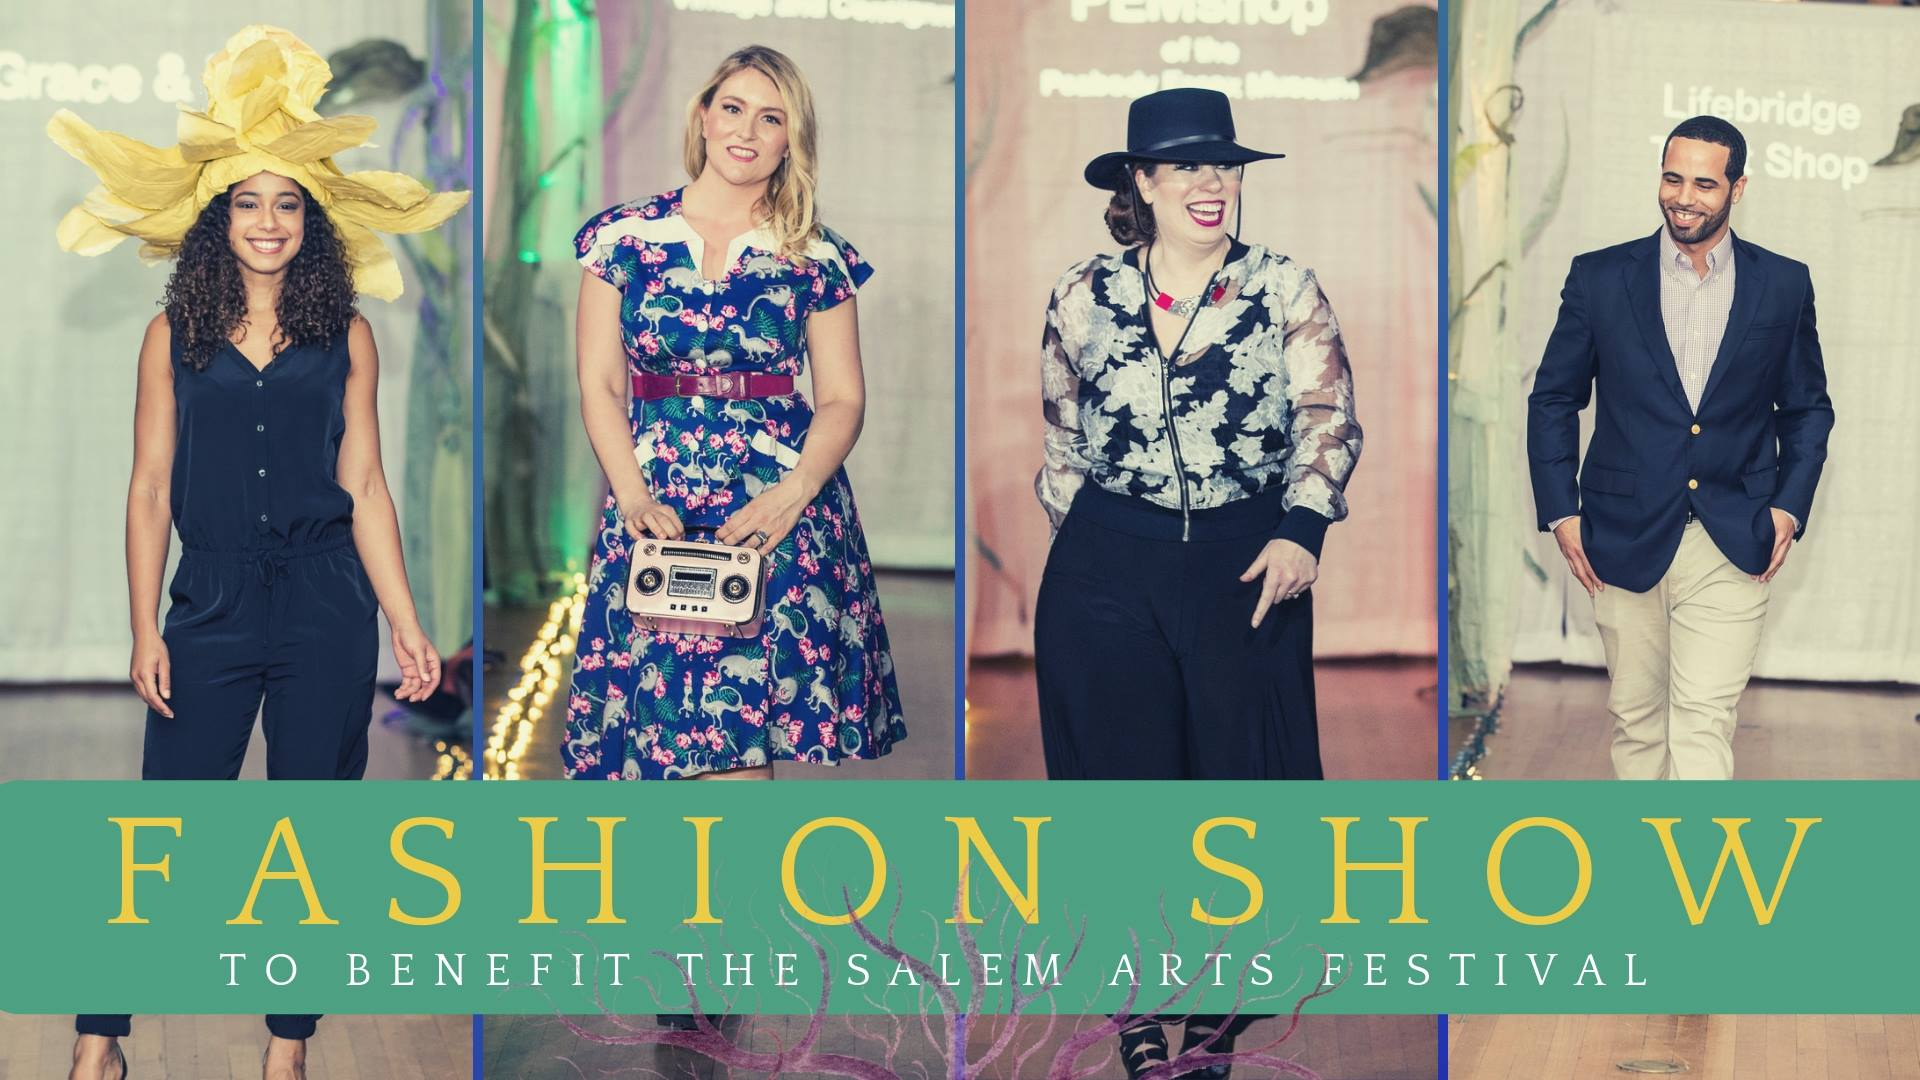 Salem Arts Festival Fundraiser: Fashion Show